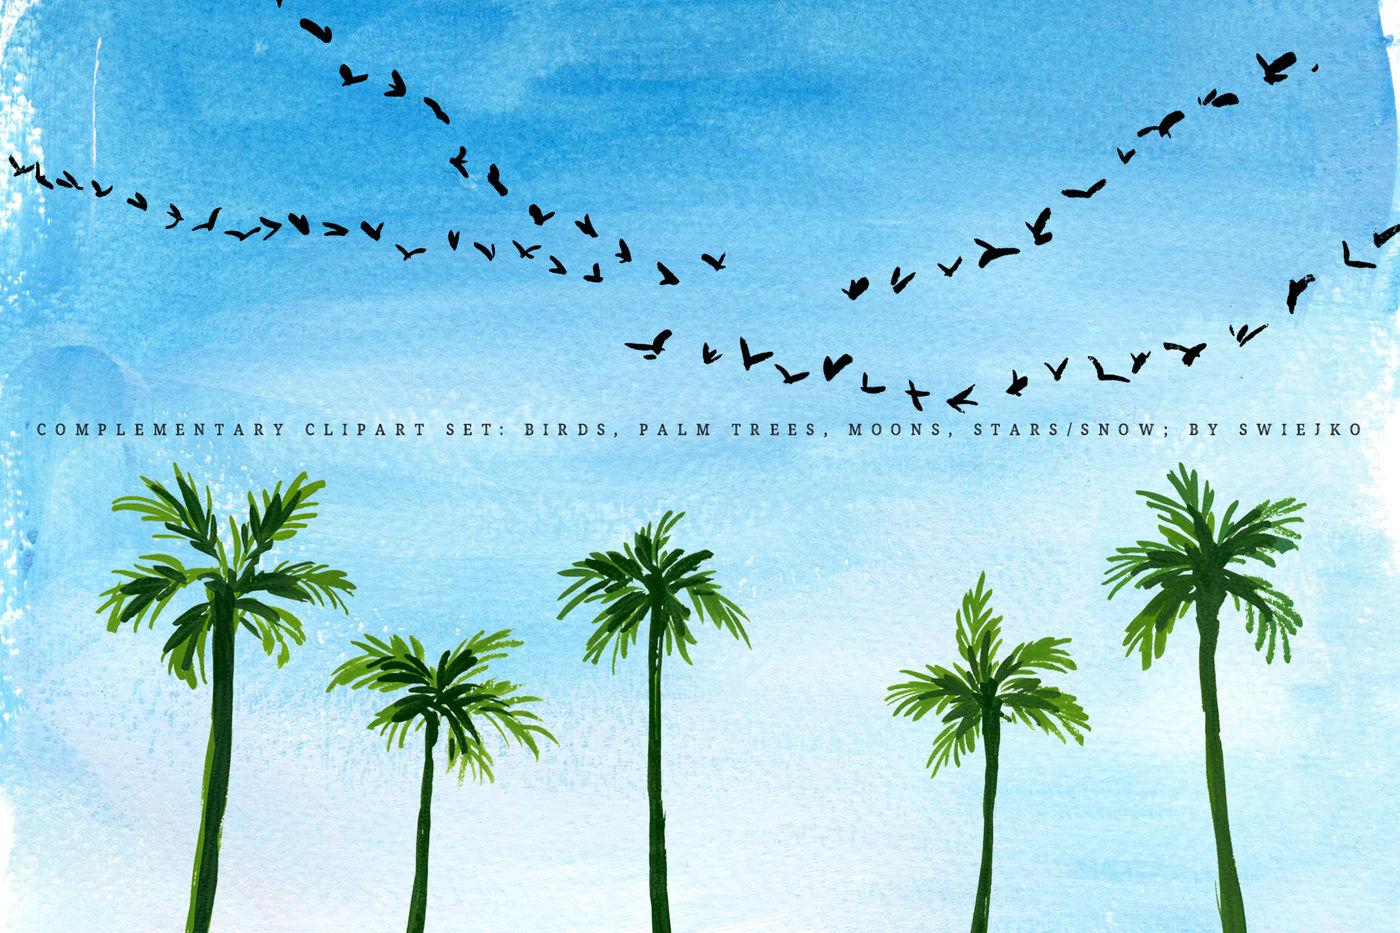 Sky Background Illustration Set By Swiejko Thehungryjpeg Com